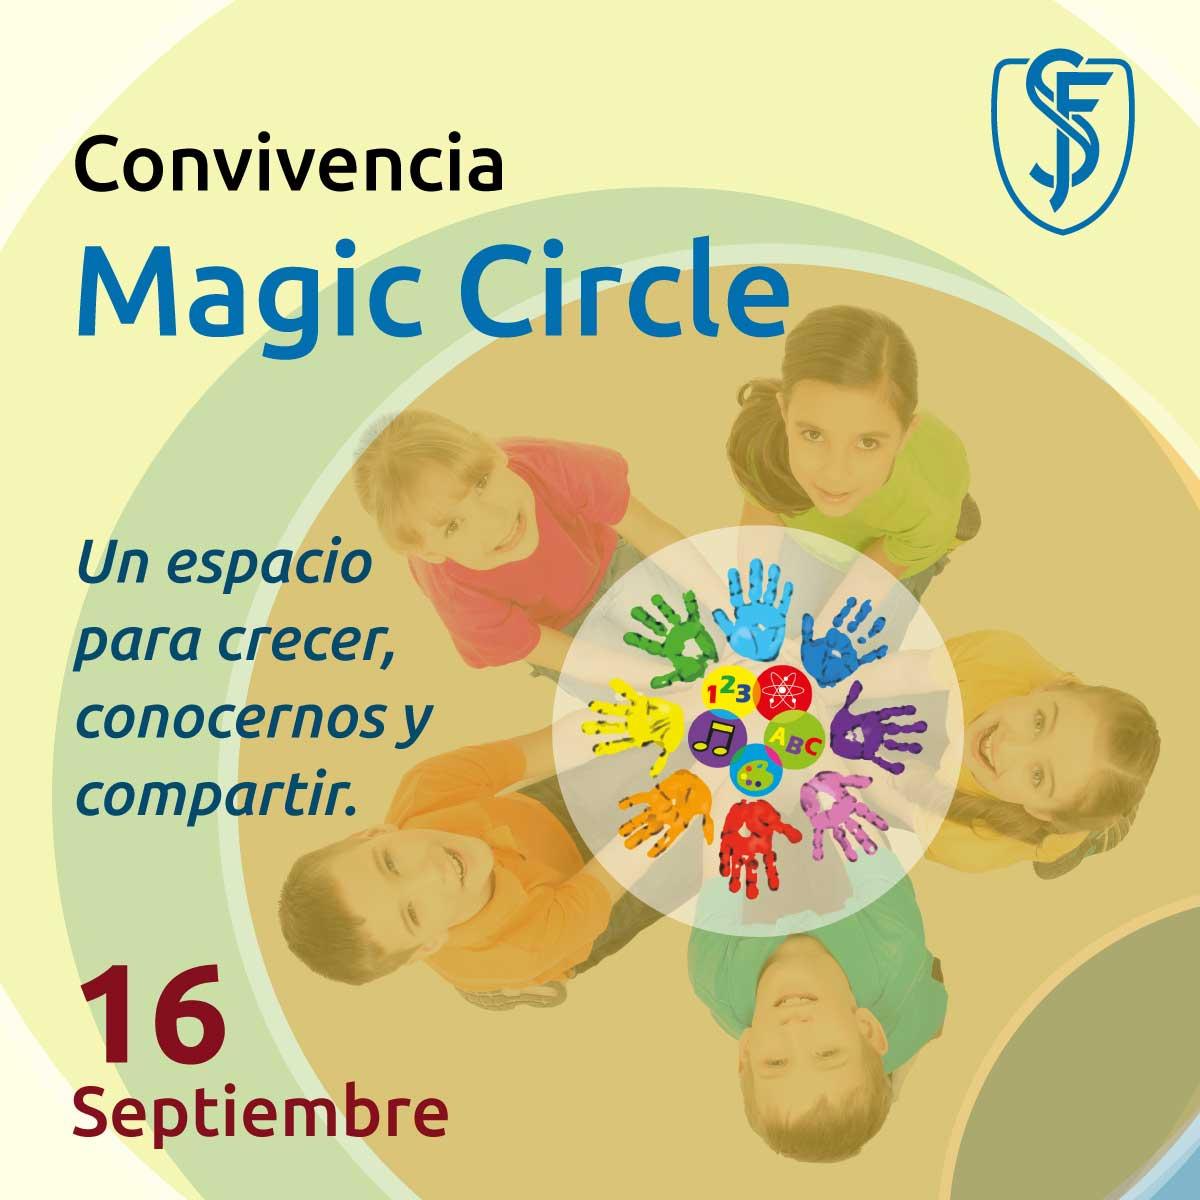 convivencia-magic-circle